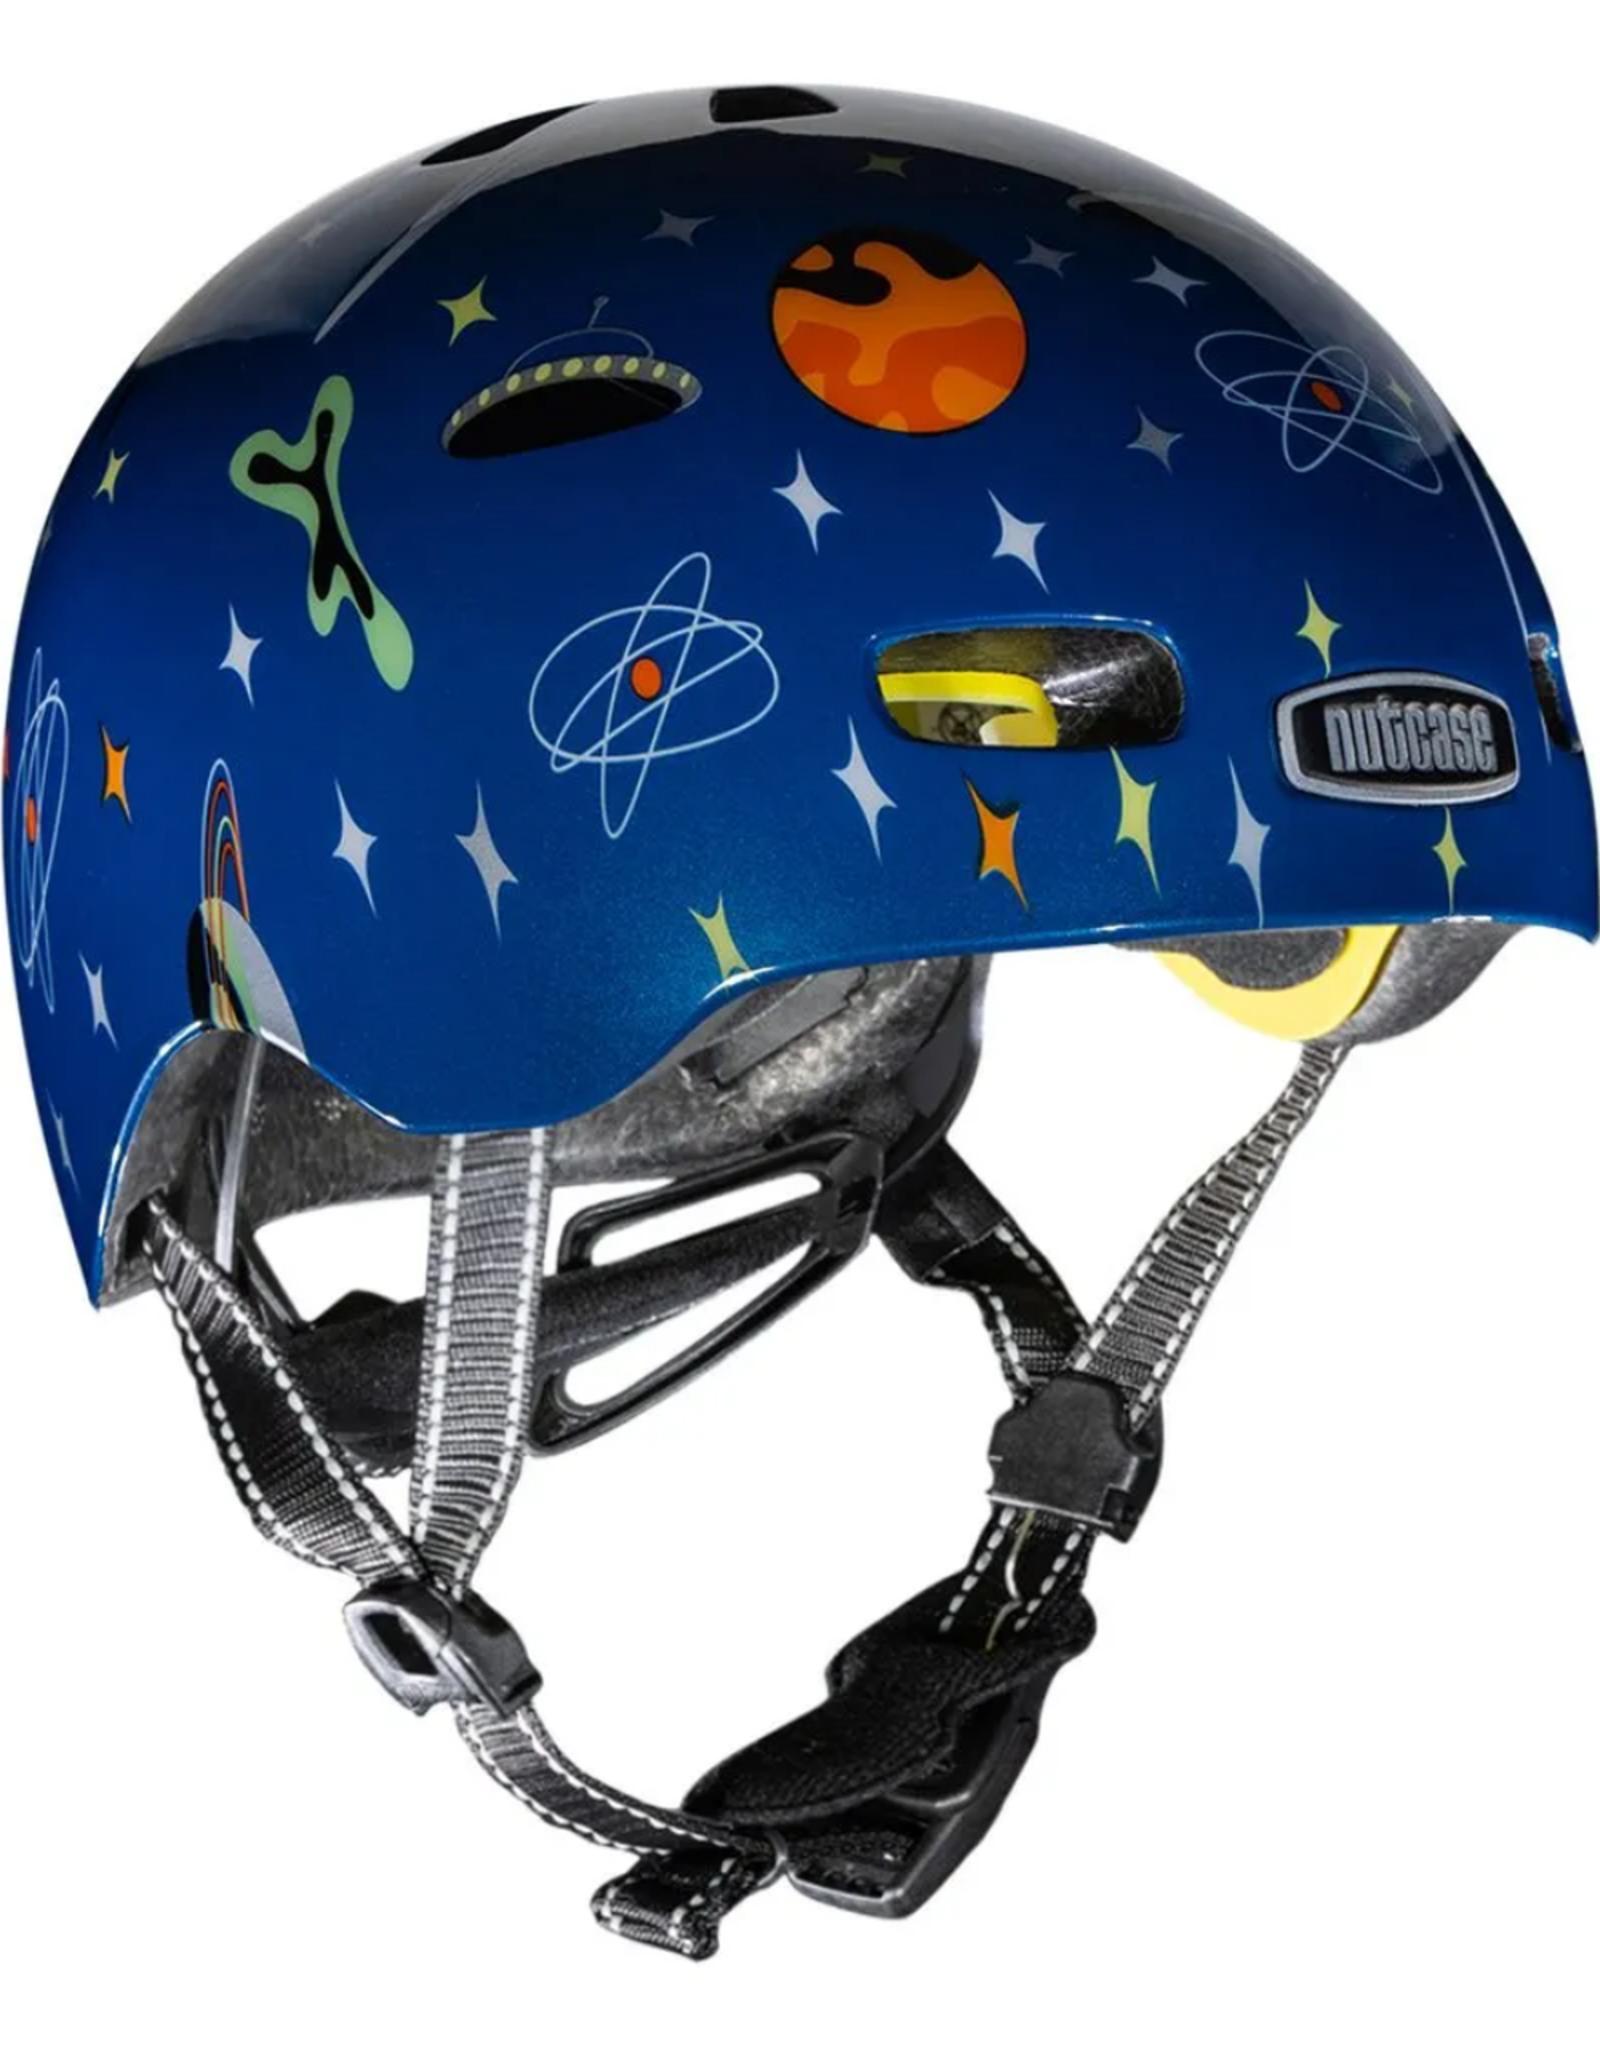 Nutcase Baby Nutty MIPS Helmets